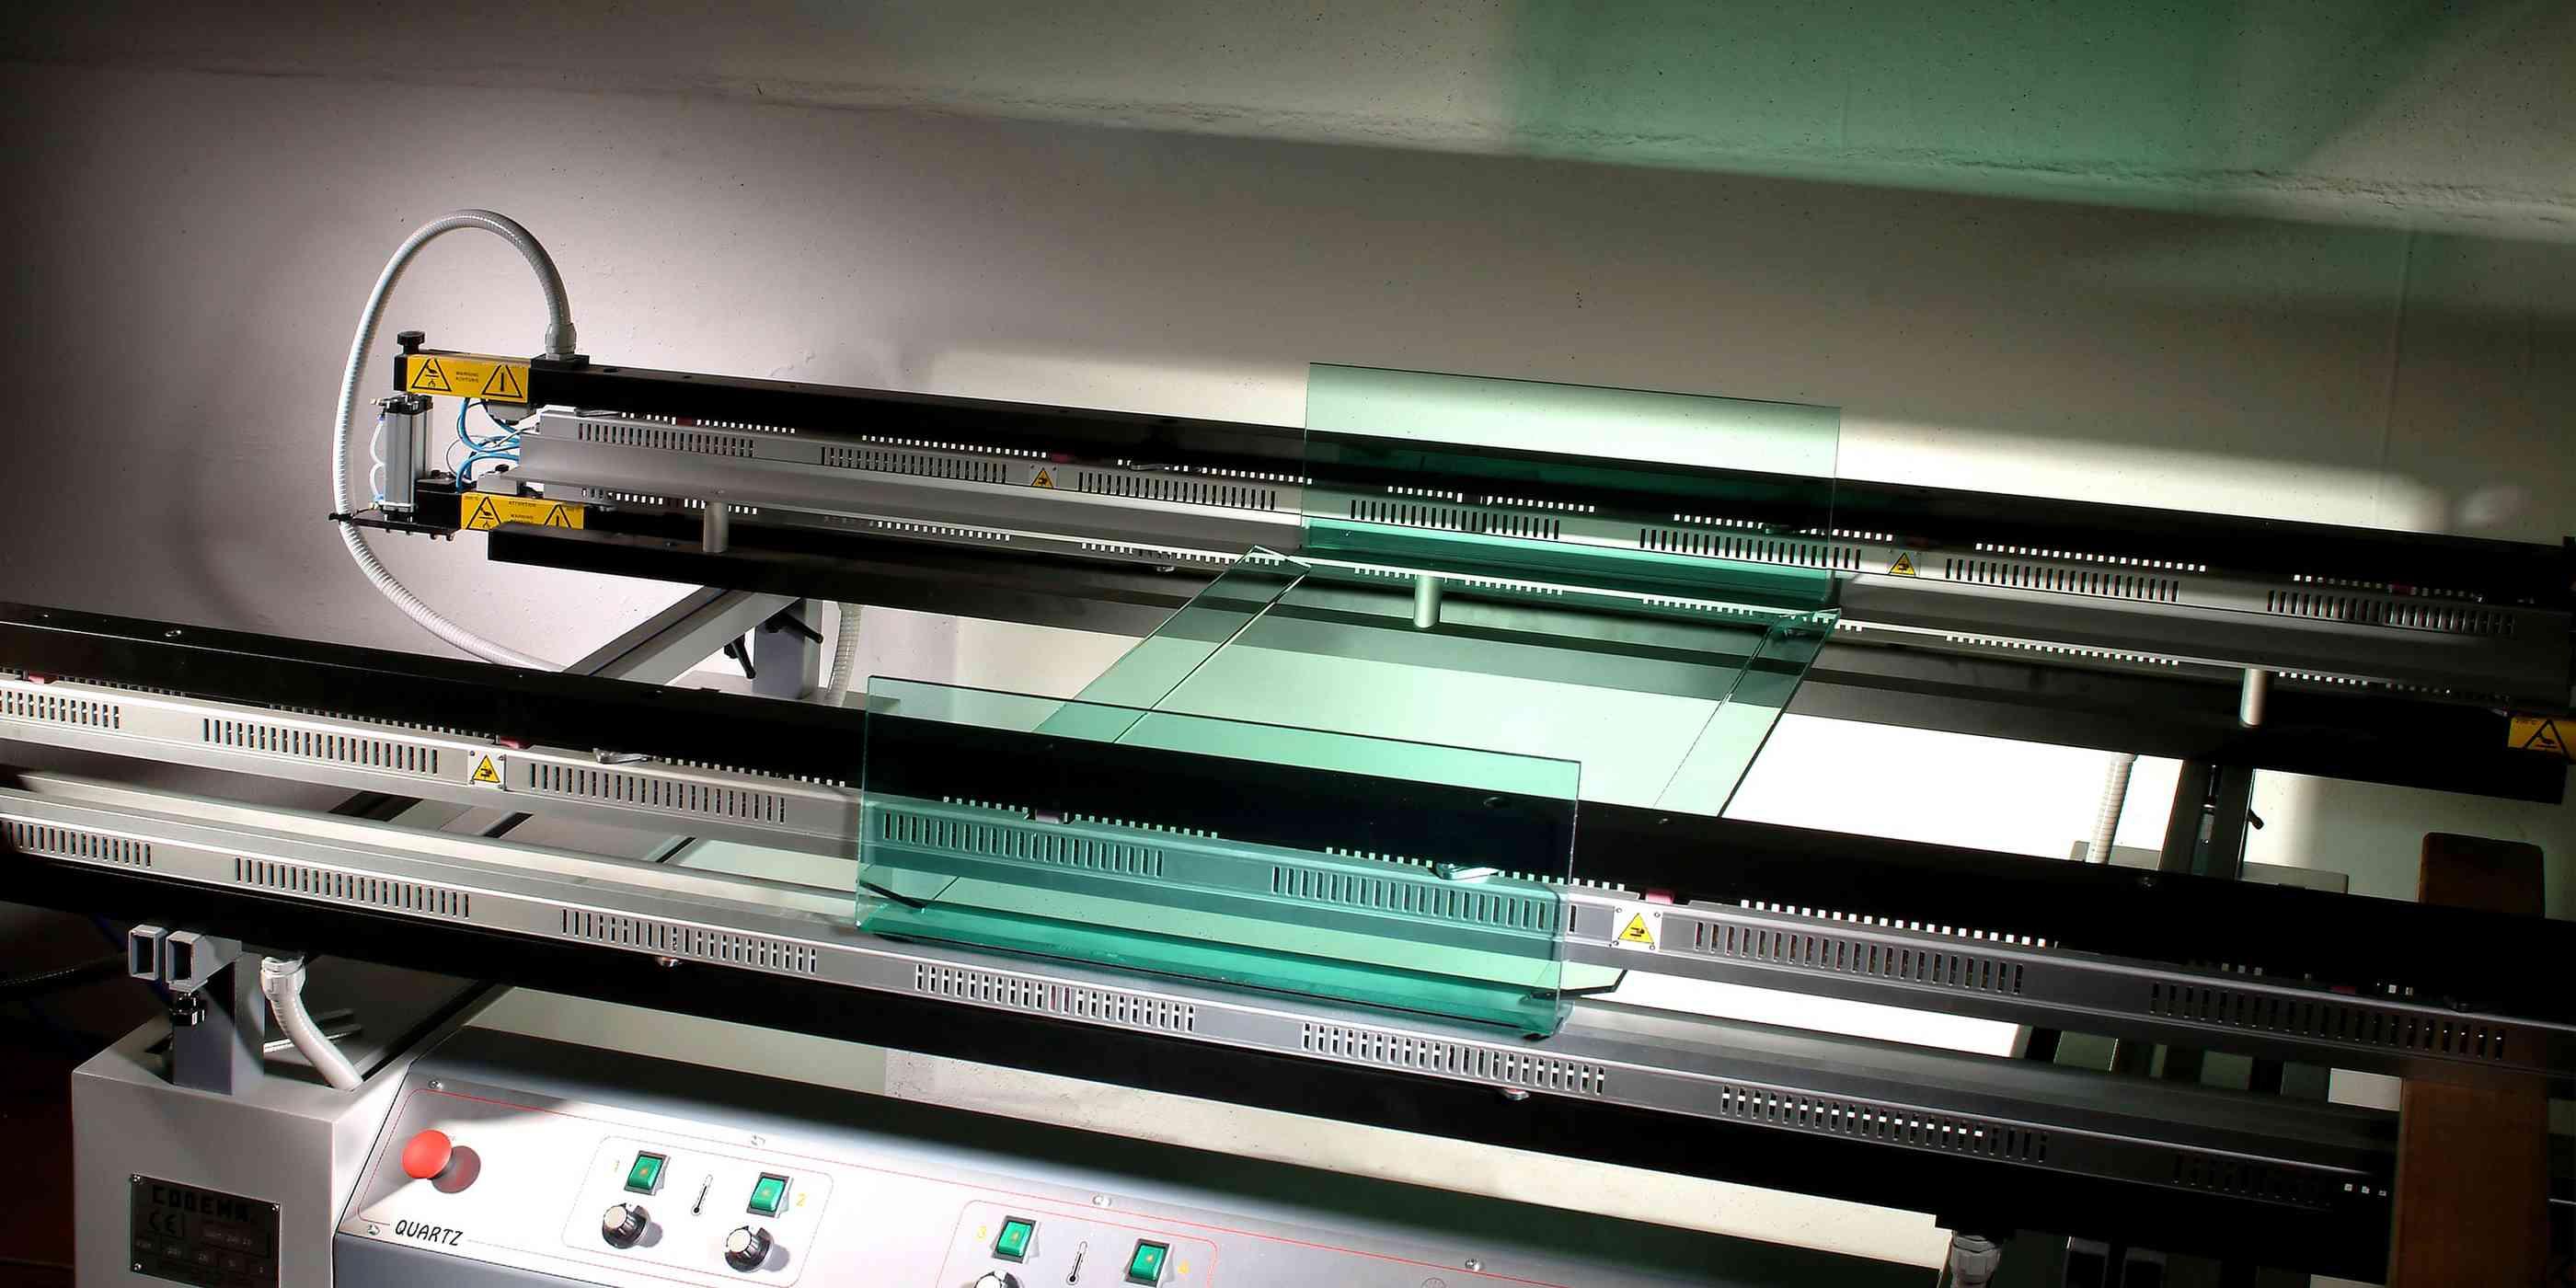 Bending thermoplastics